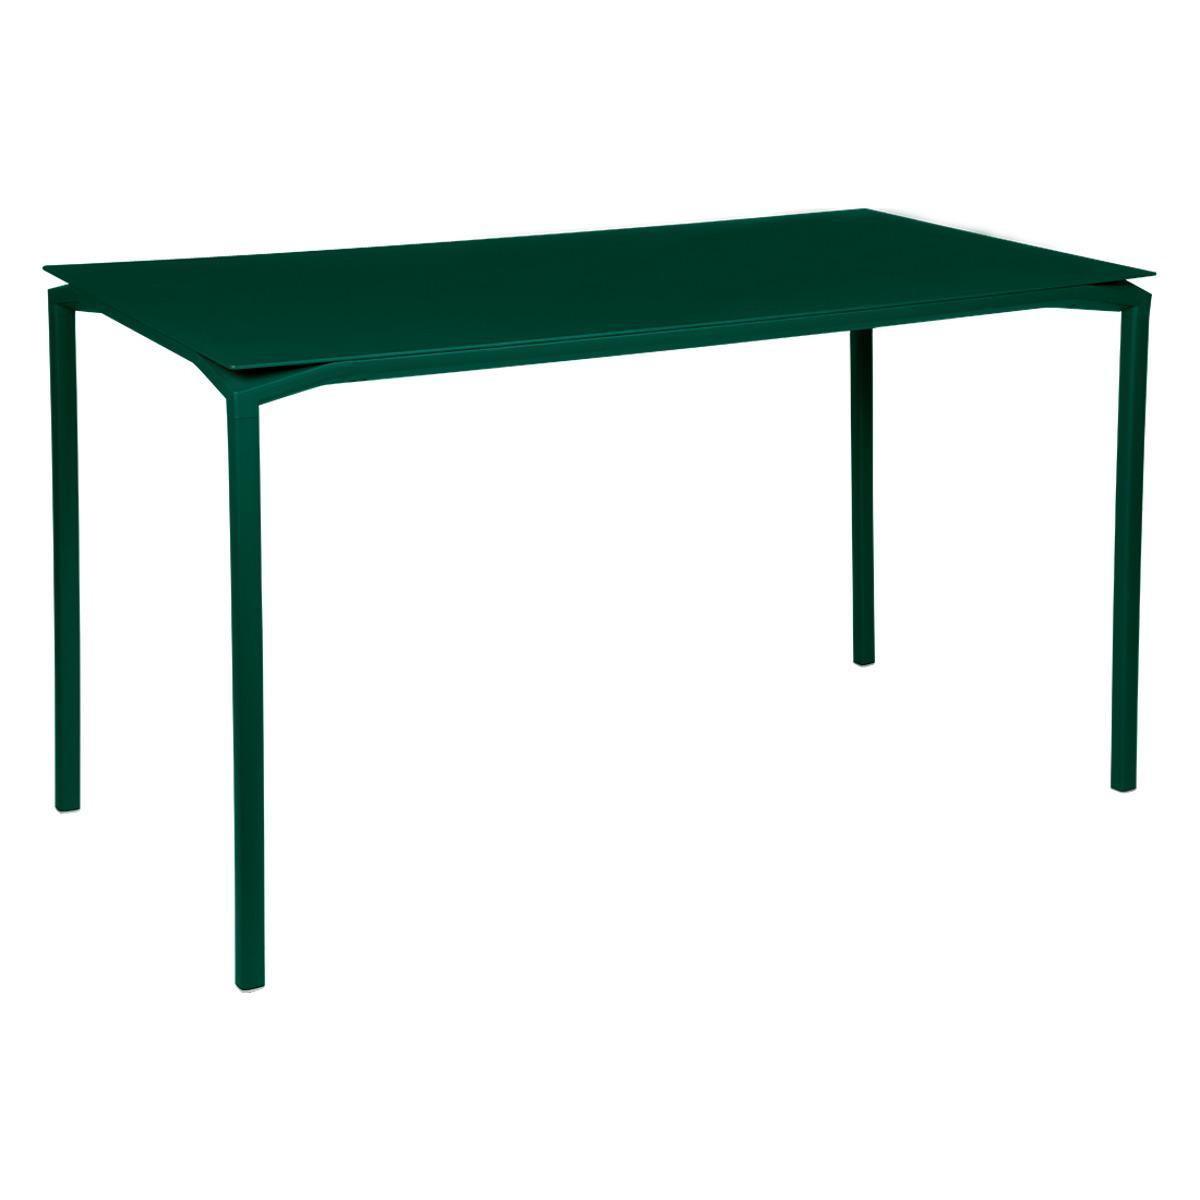 Table 80x160cm CALVI Fermob vert cèdre